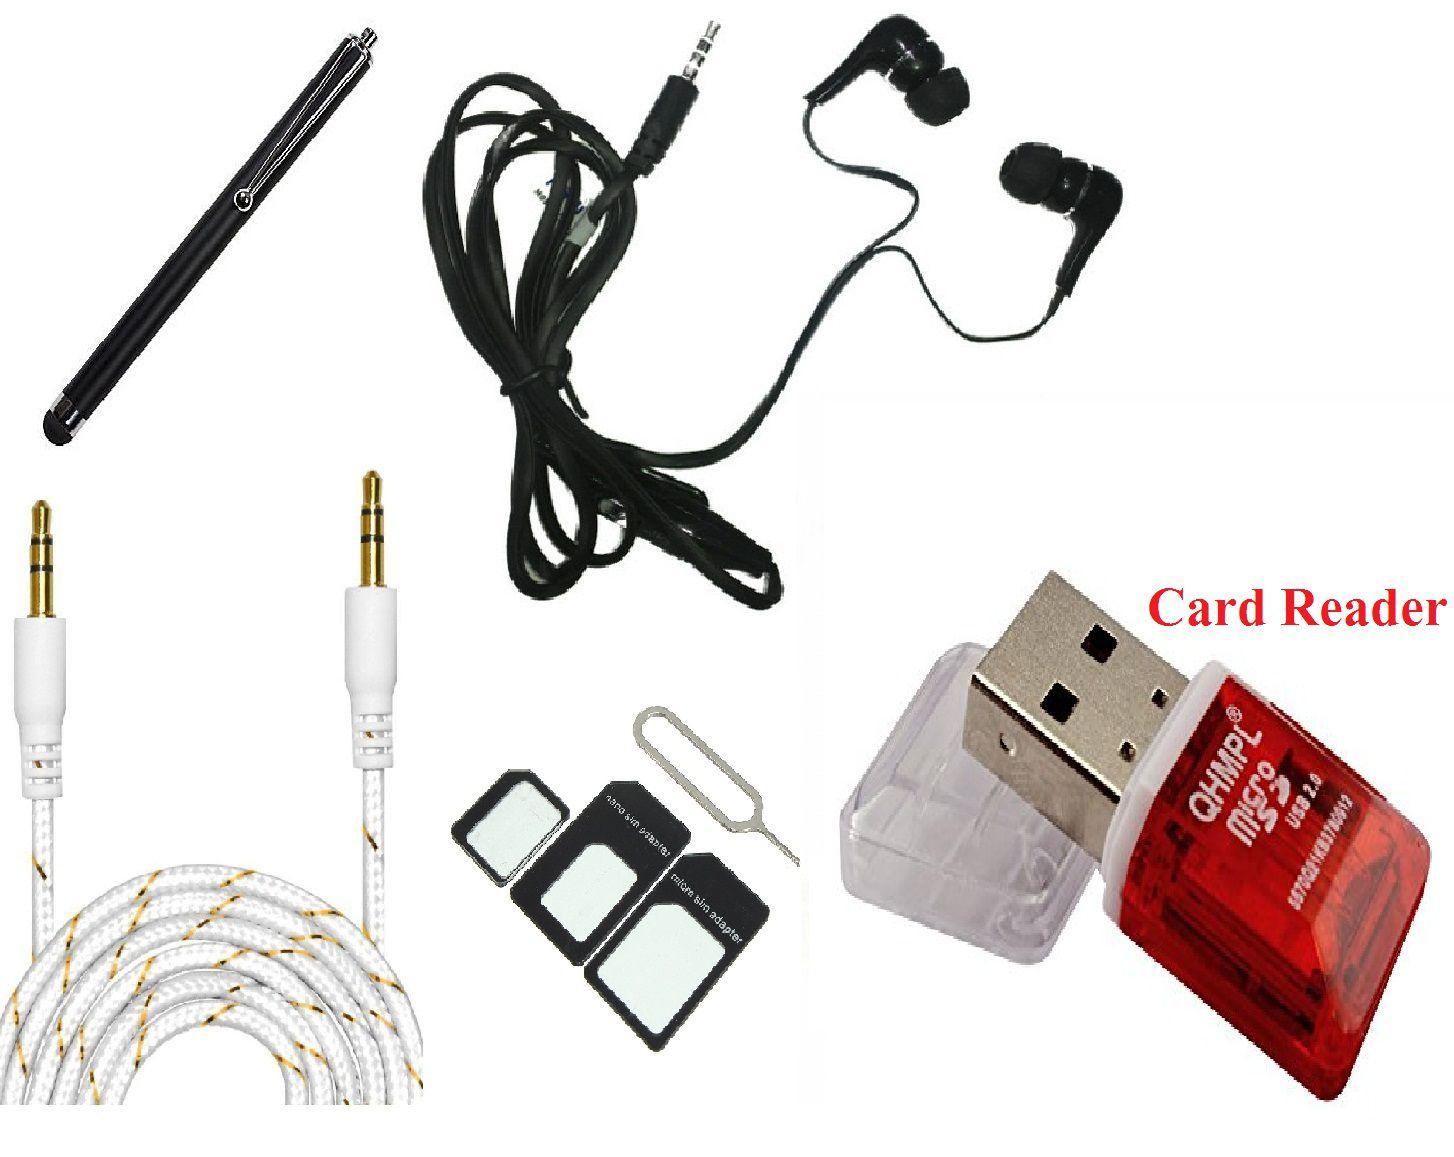 Lenovo Zuk Z2 Accessories Combo,VinyakMobile Earphone, Aux Cable, Stylus  Pen, Card Reader, Sim Adapter, For - Lenovo Zuk Z2